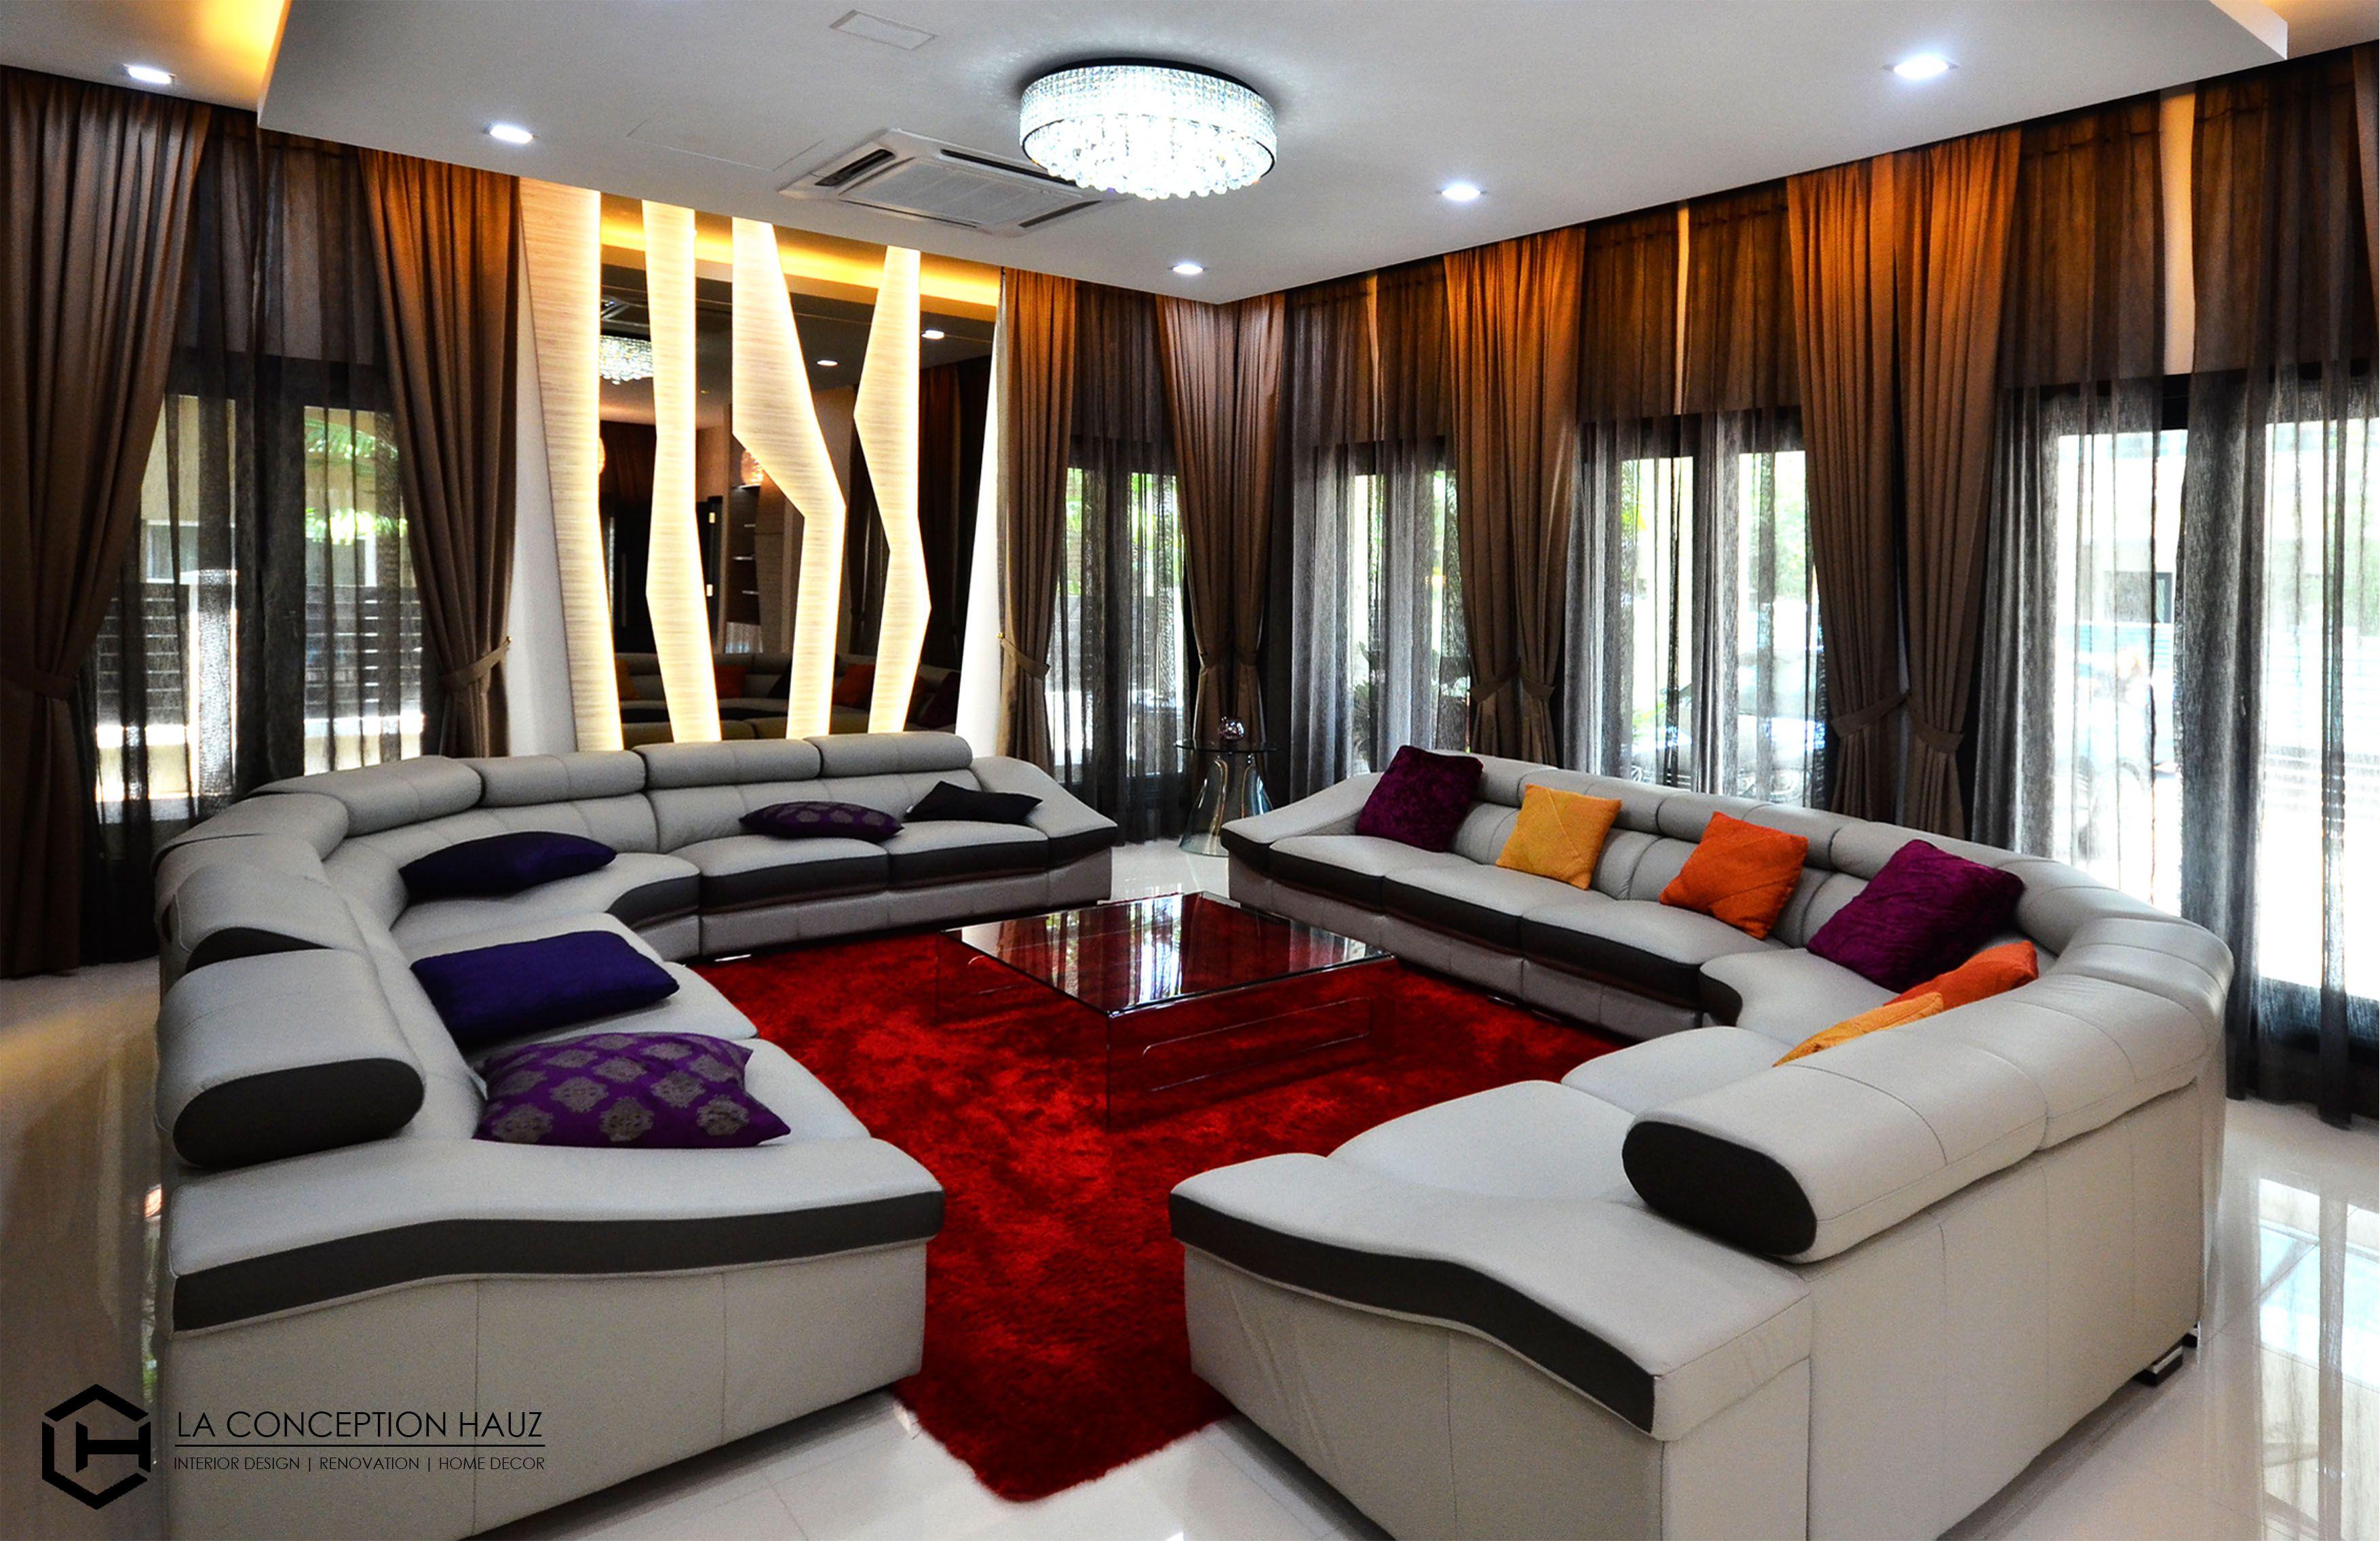 70 Living Room Design Ideas to Welcome You Home | Living ...